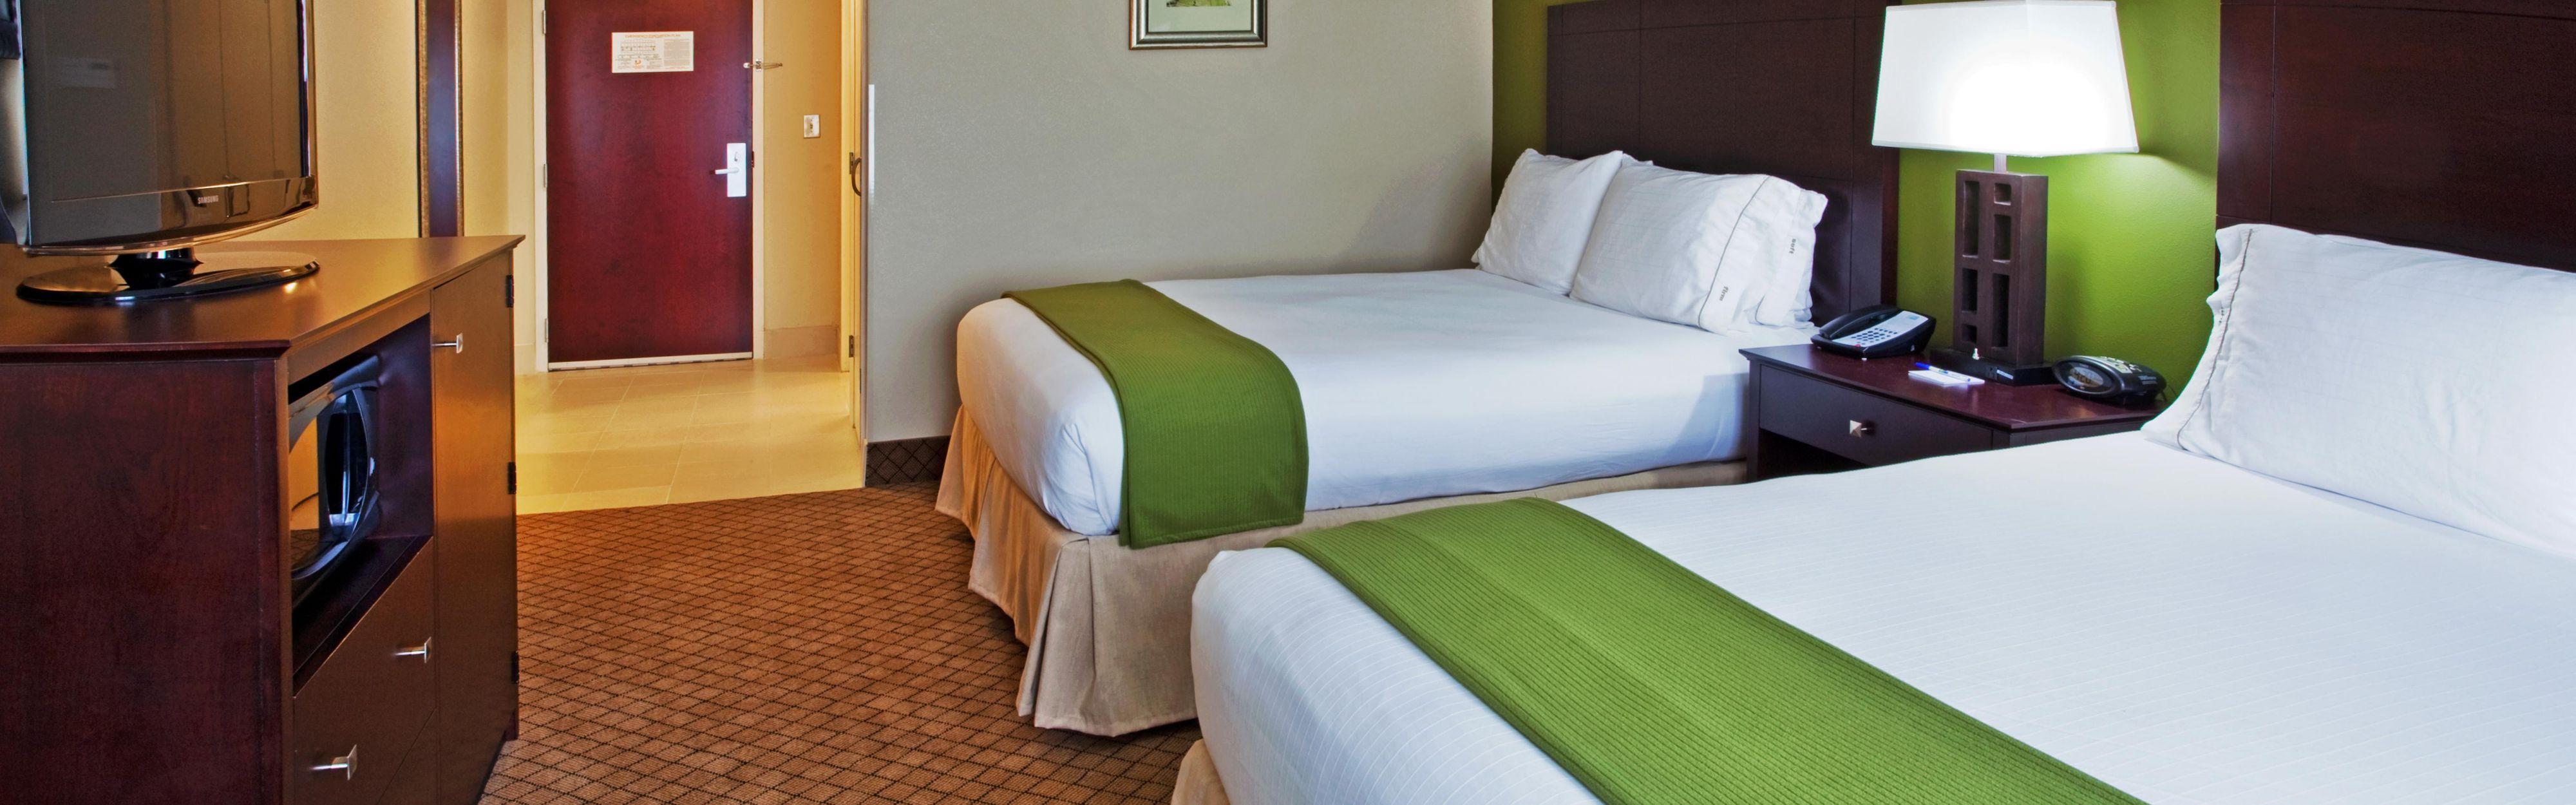 Holiday Inn Express & Suites Columbus-Fort Benning image 1